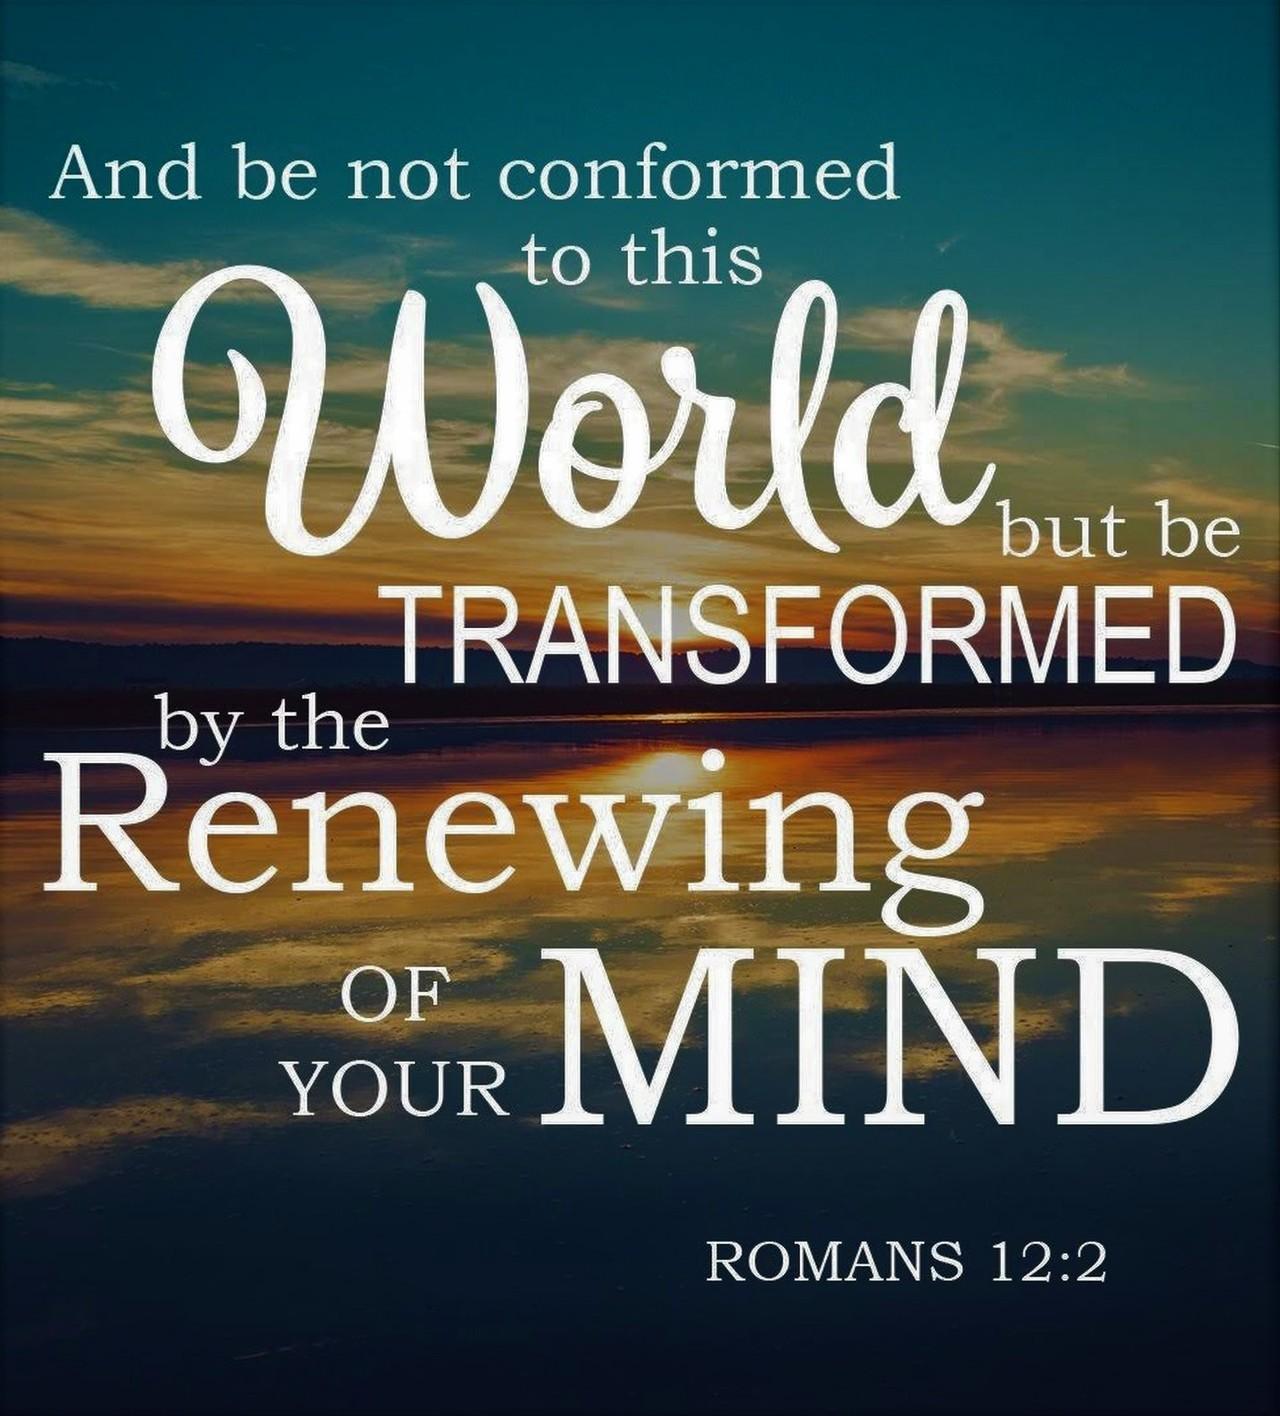 The Living... — Romans 12:2 (KJV) - And be not conformed ...